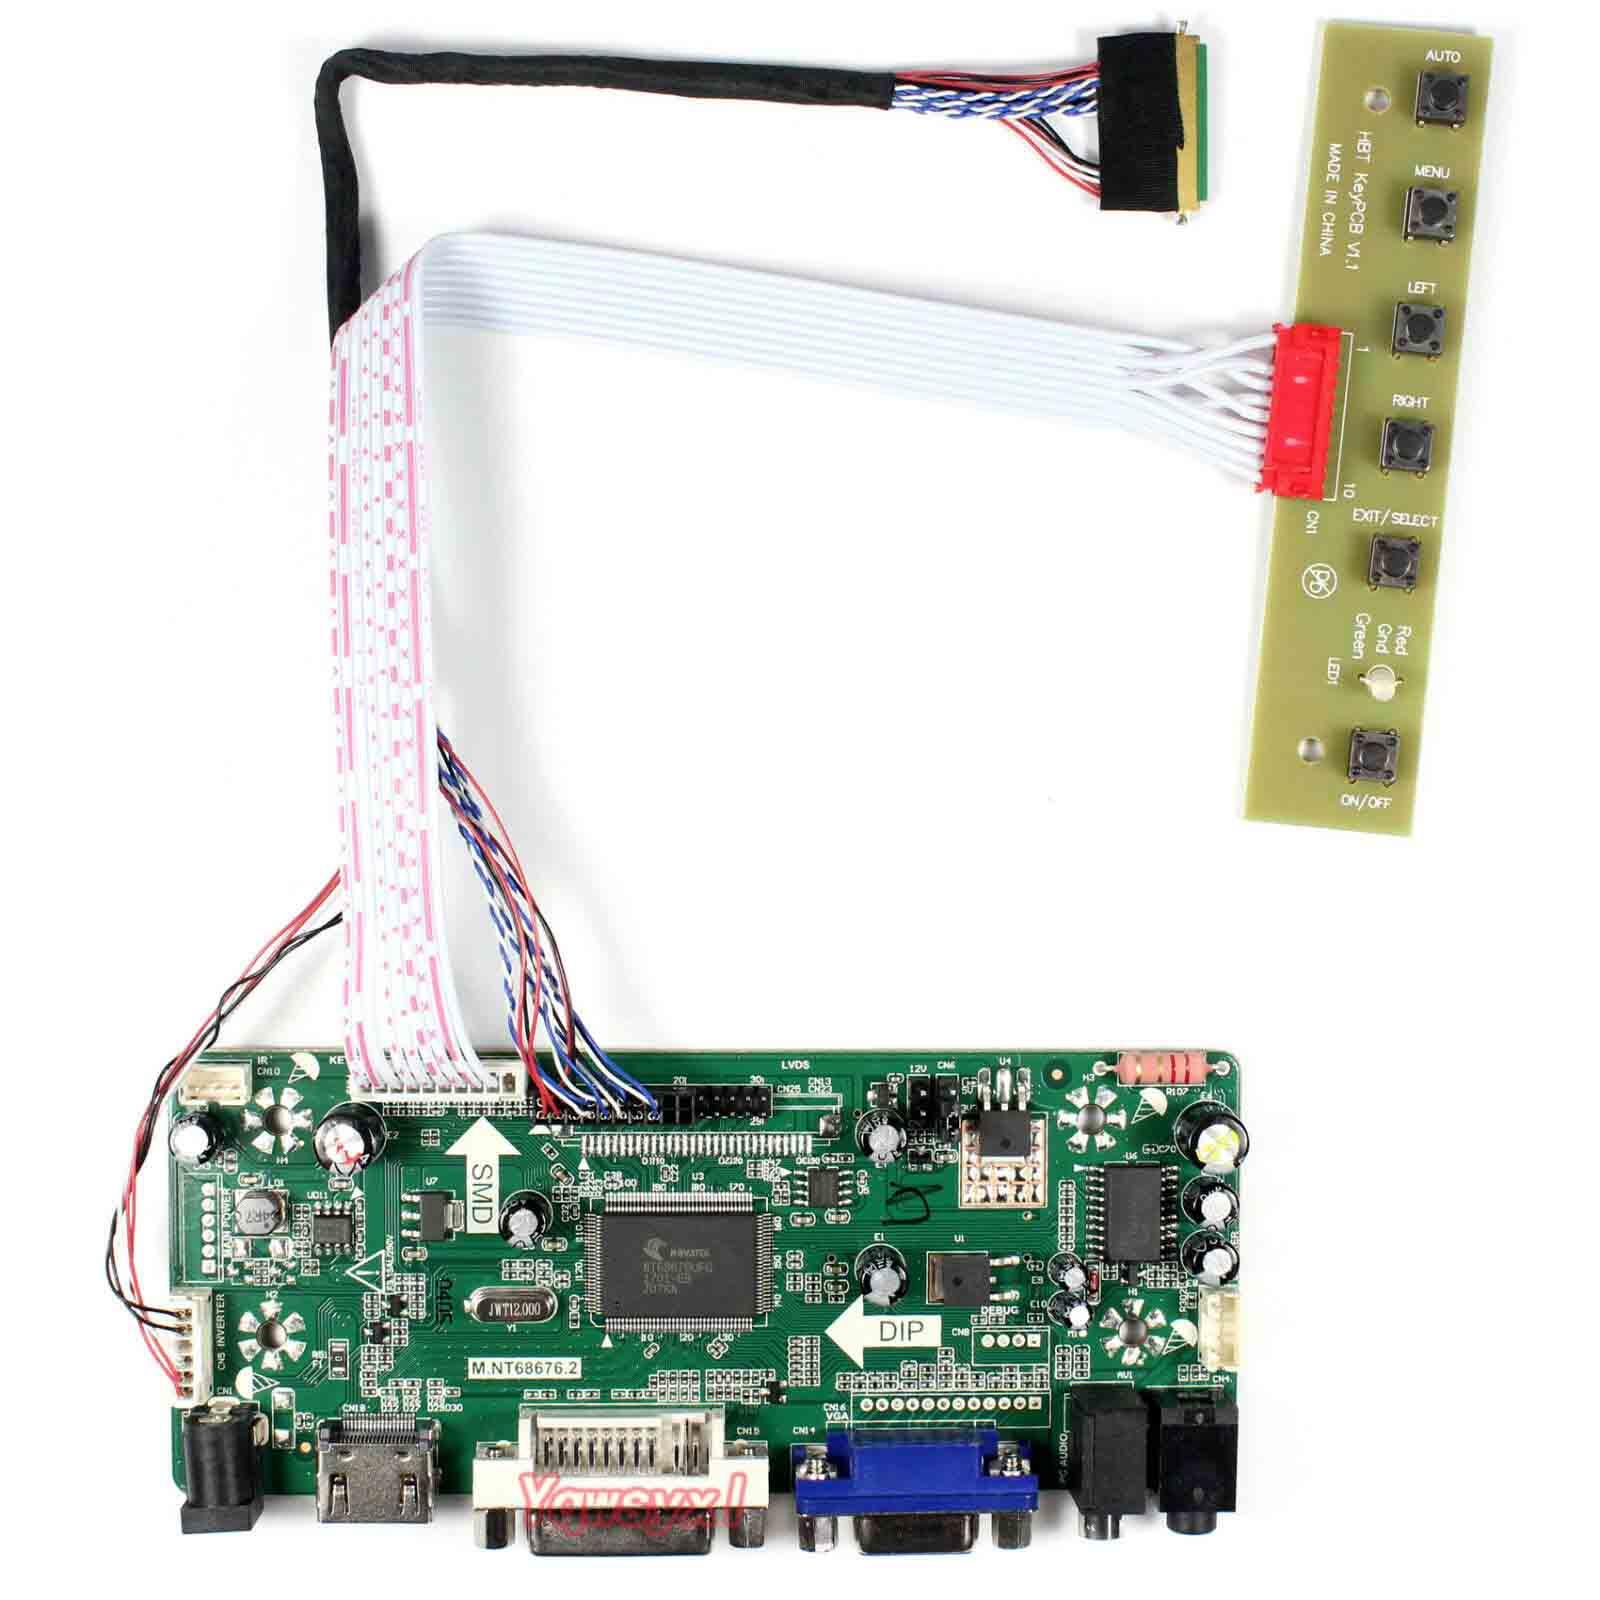 Yqwsyxl Control Board Monitor Kit For LTN156AR21-002  HDMI + DVI + VGA LCD LED Screen  Controller  Board Driver